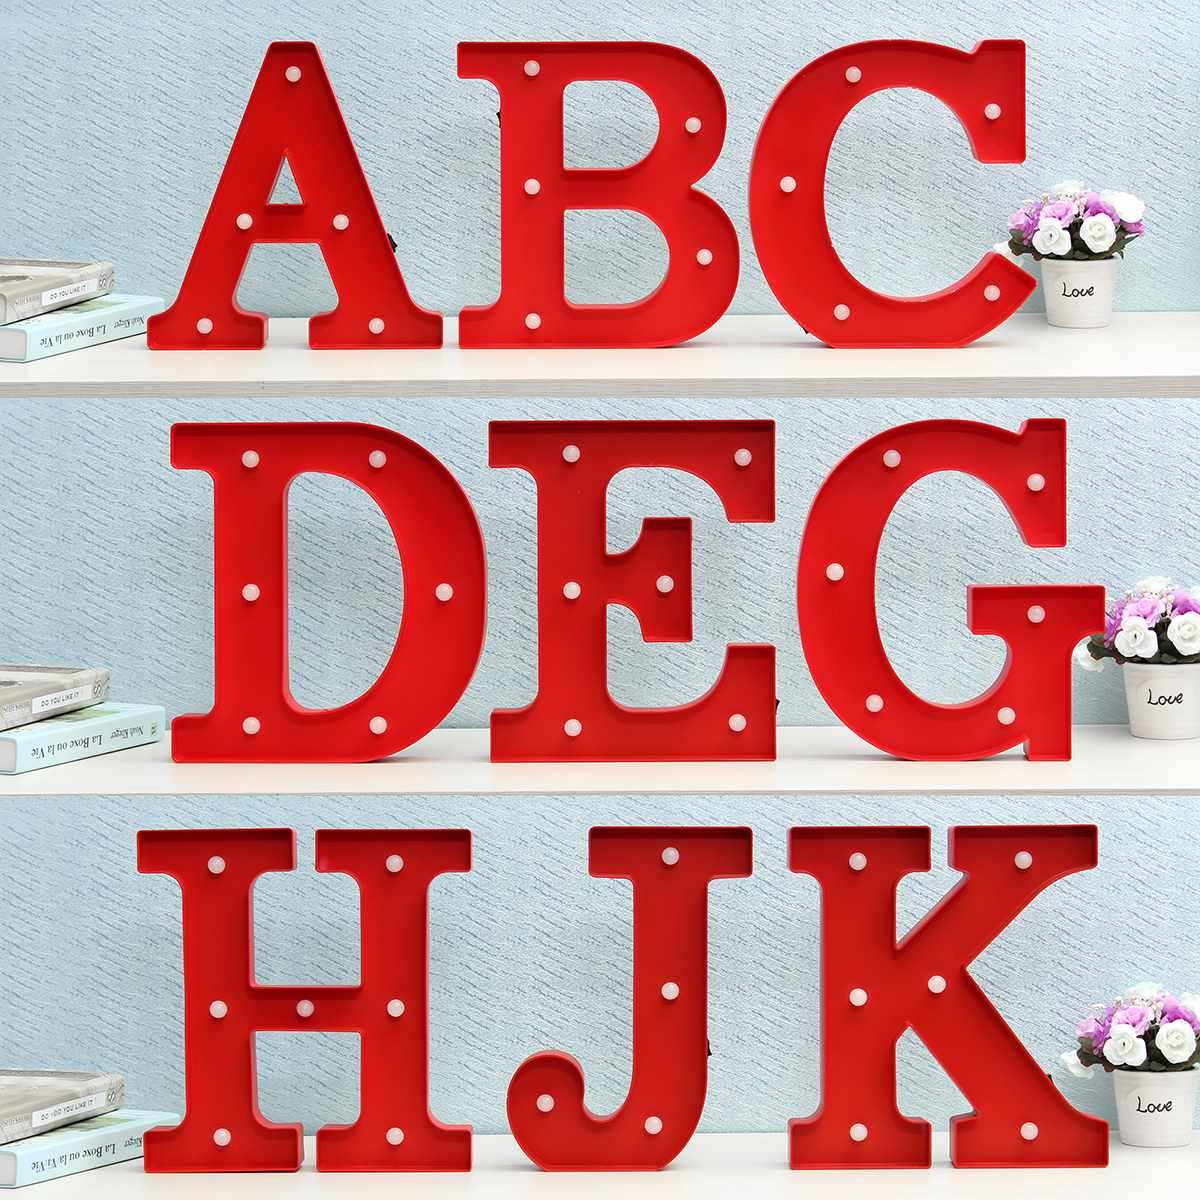 Led night light lamp kids marquee letter lights vintage